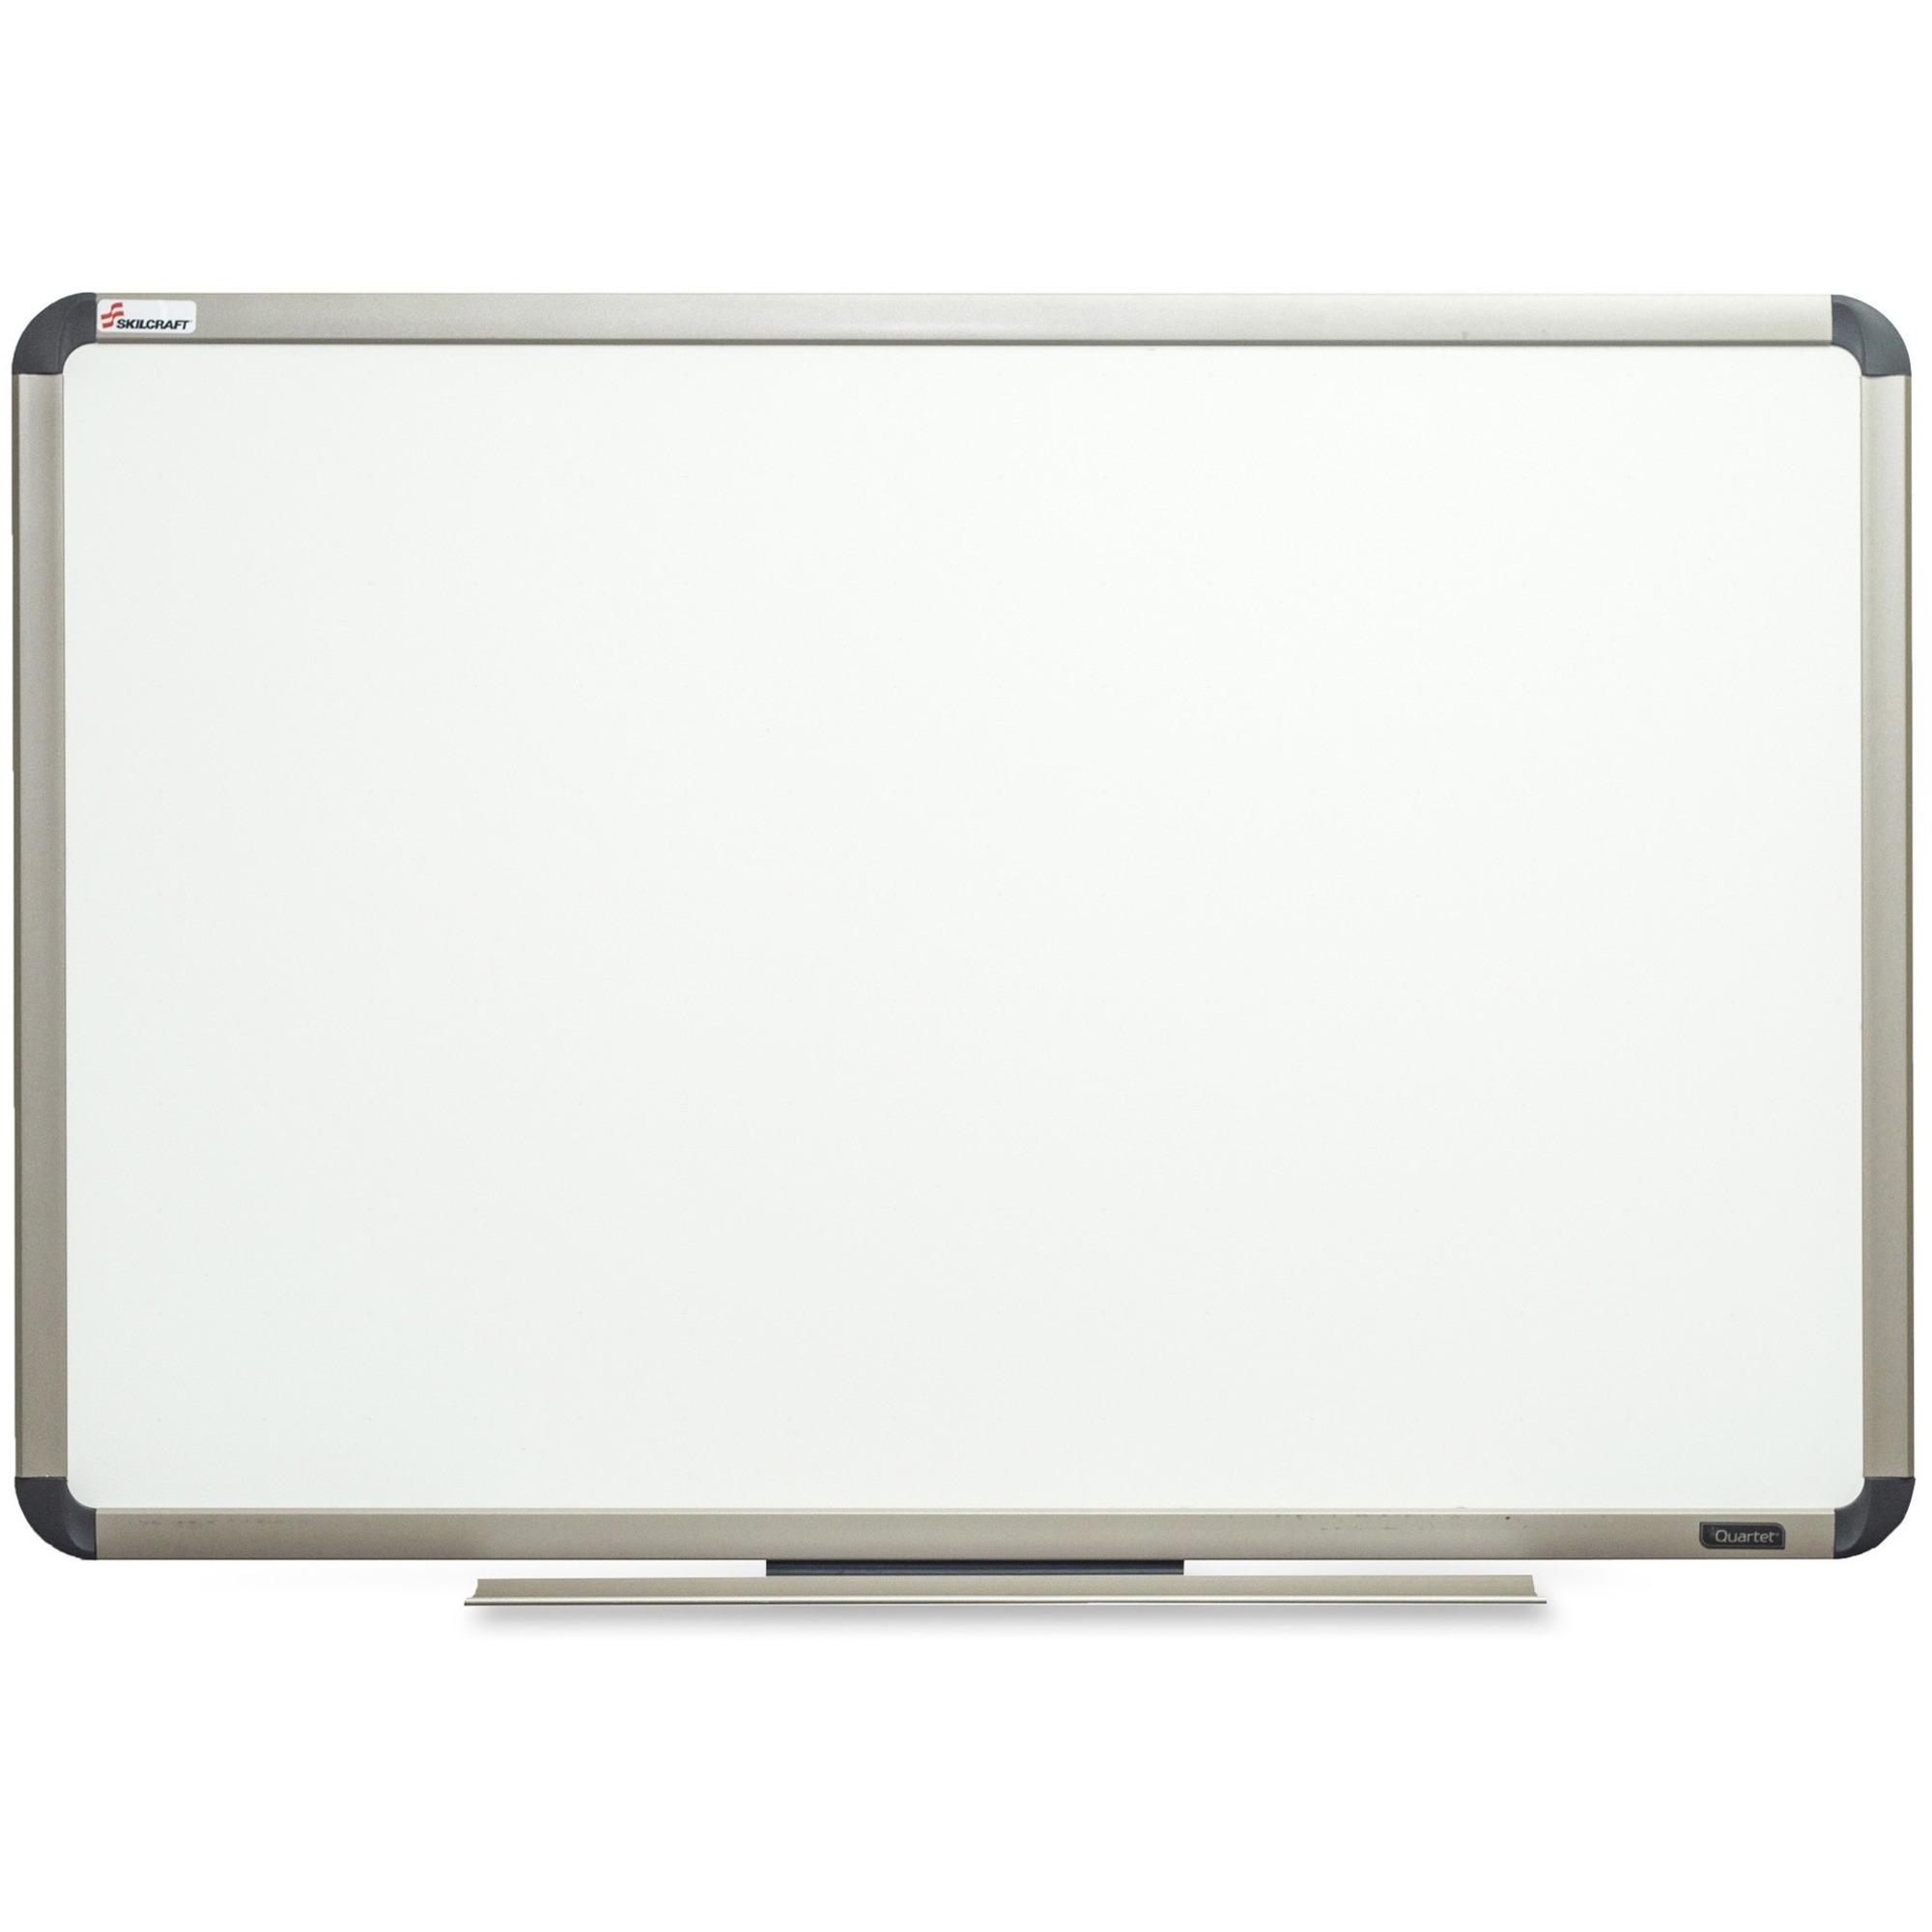 SKILCRAFT Aluminum Frame Total Erase White Board - 36